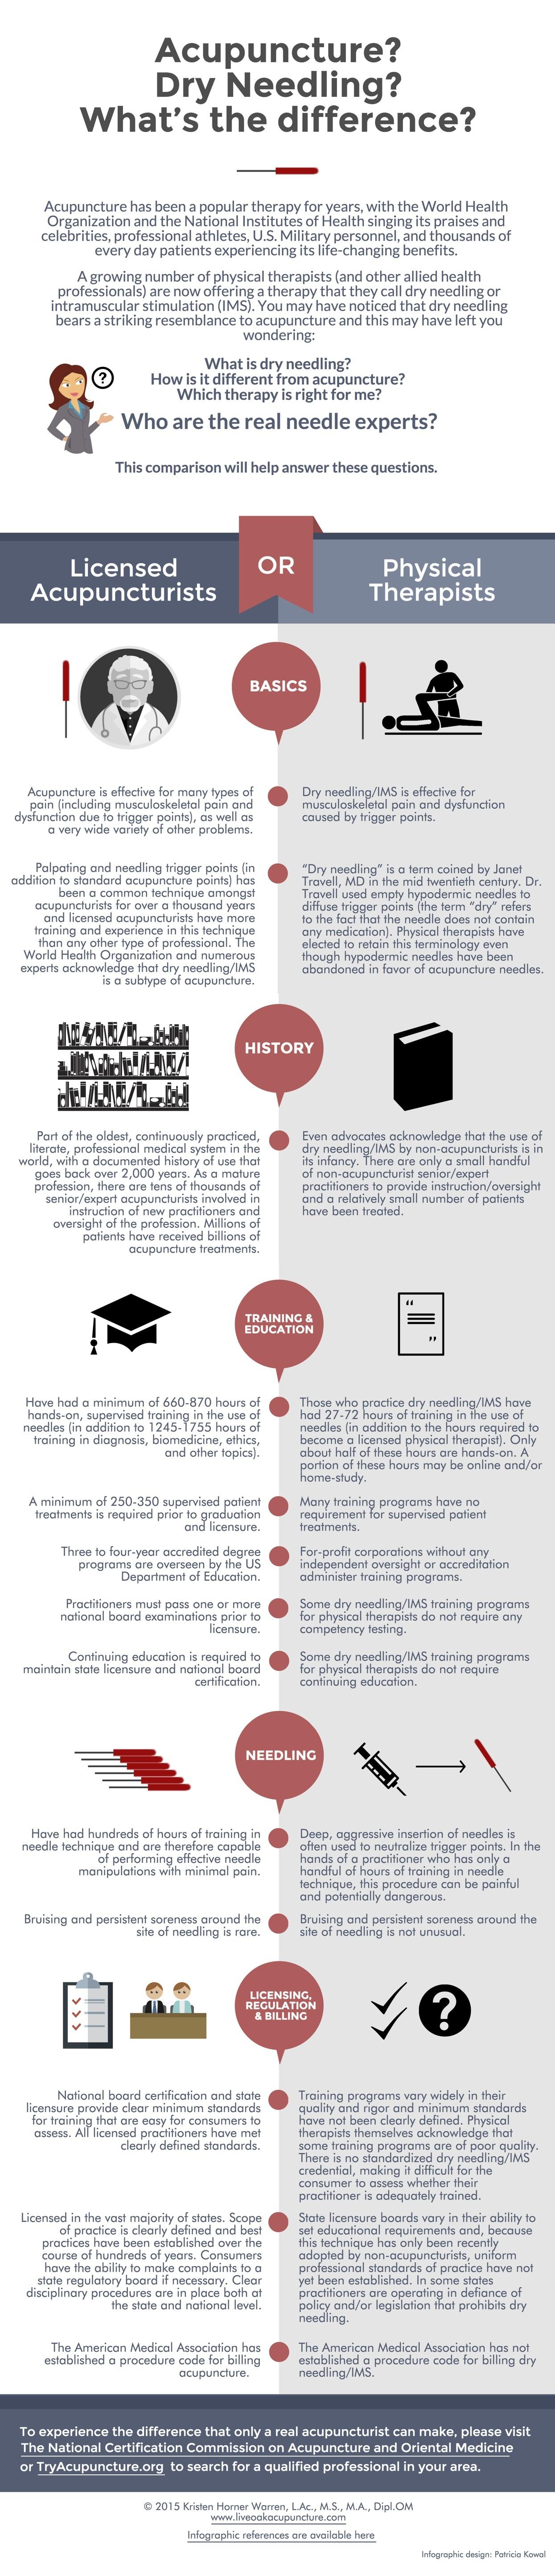 KH Warren DN infographic